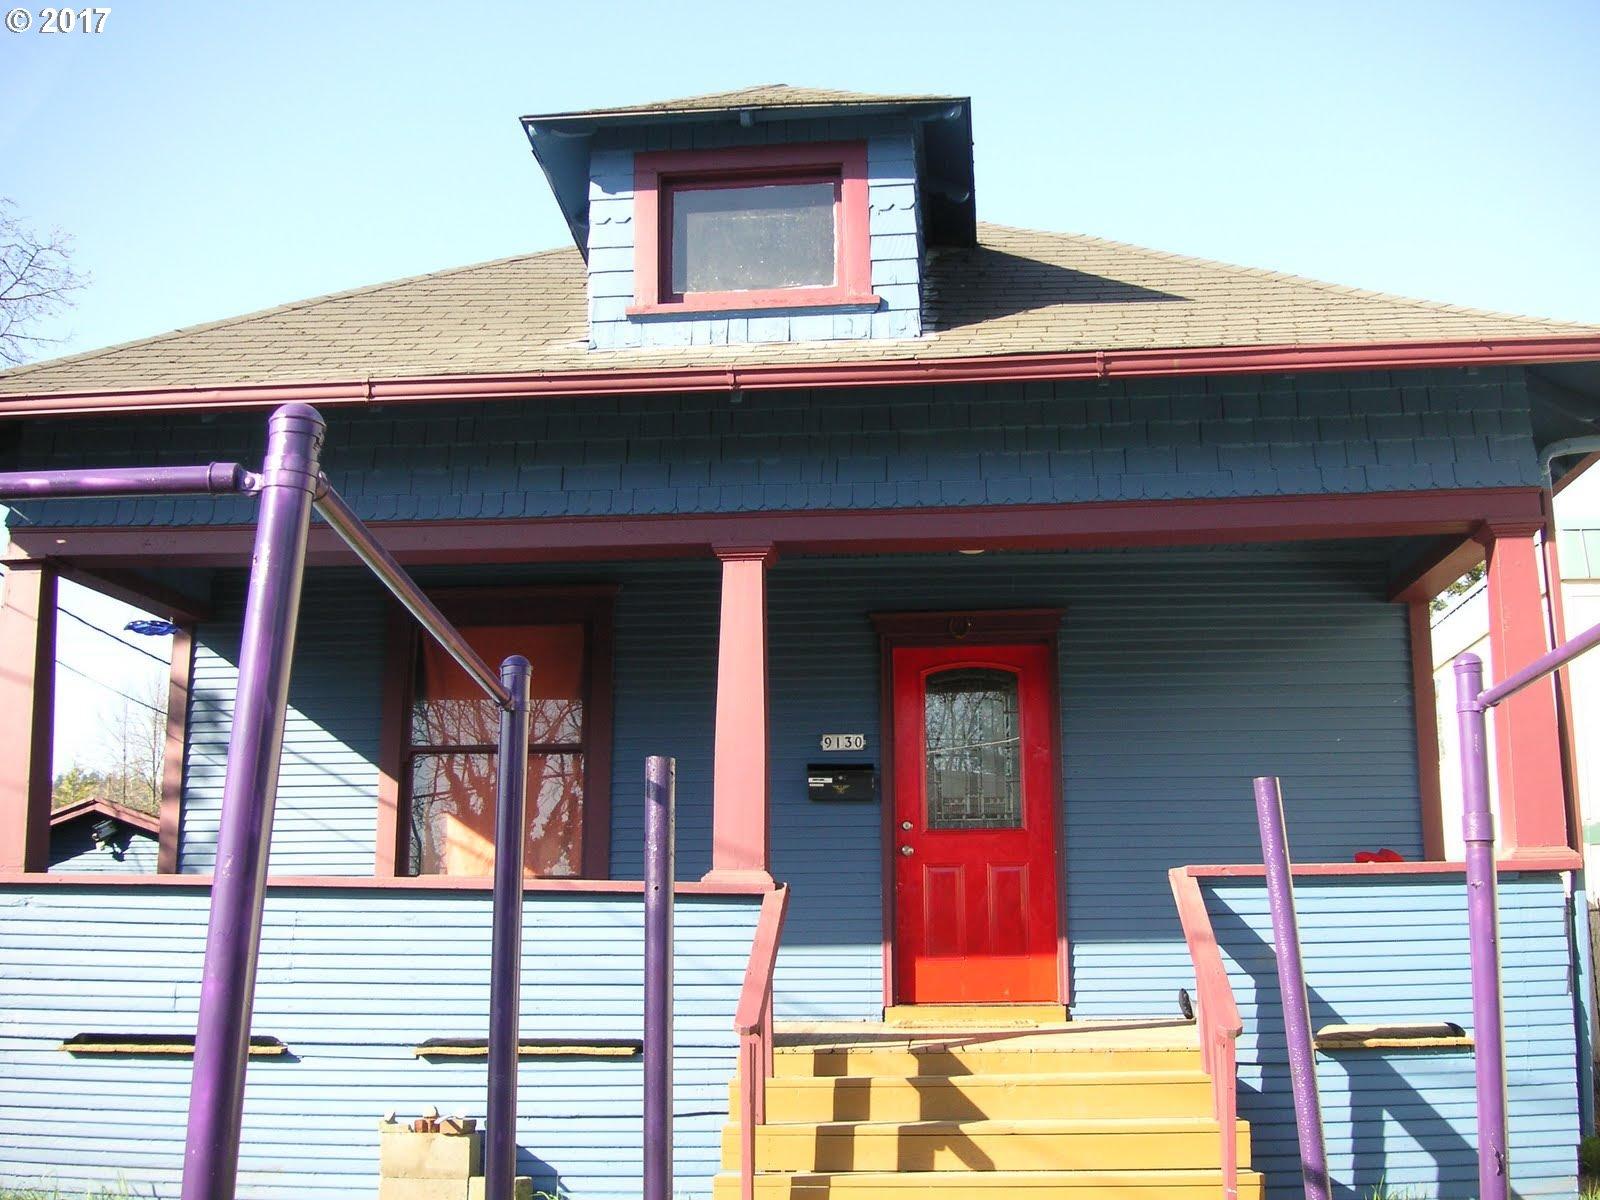 9130 N LOMBARD ST, Portland, OR 97203